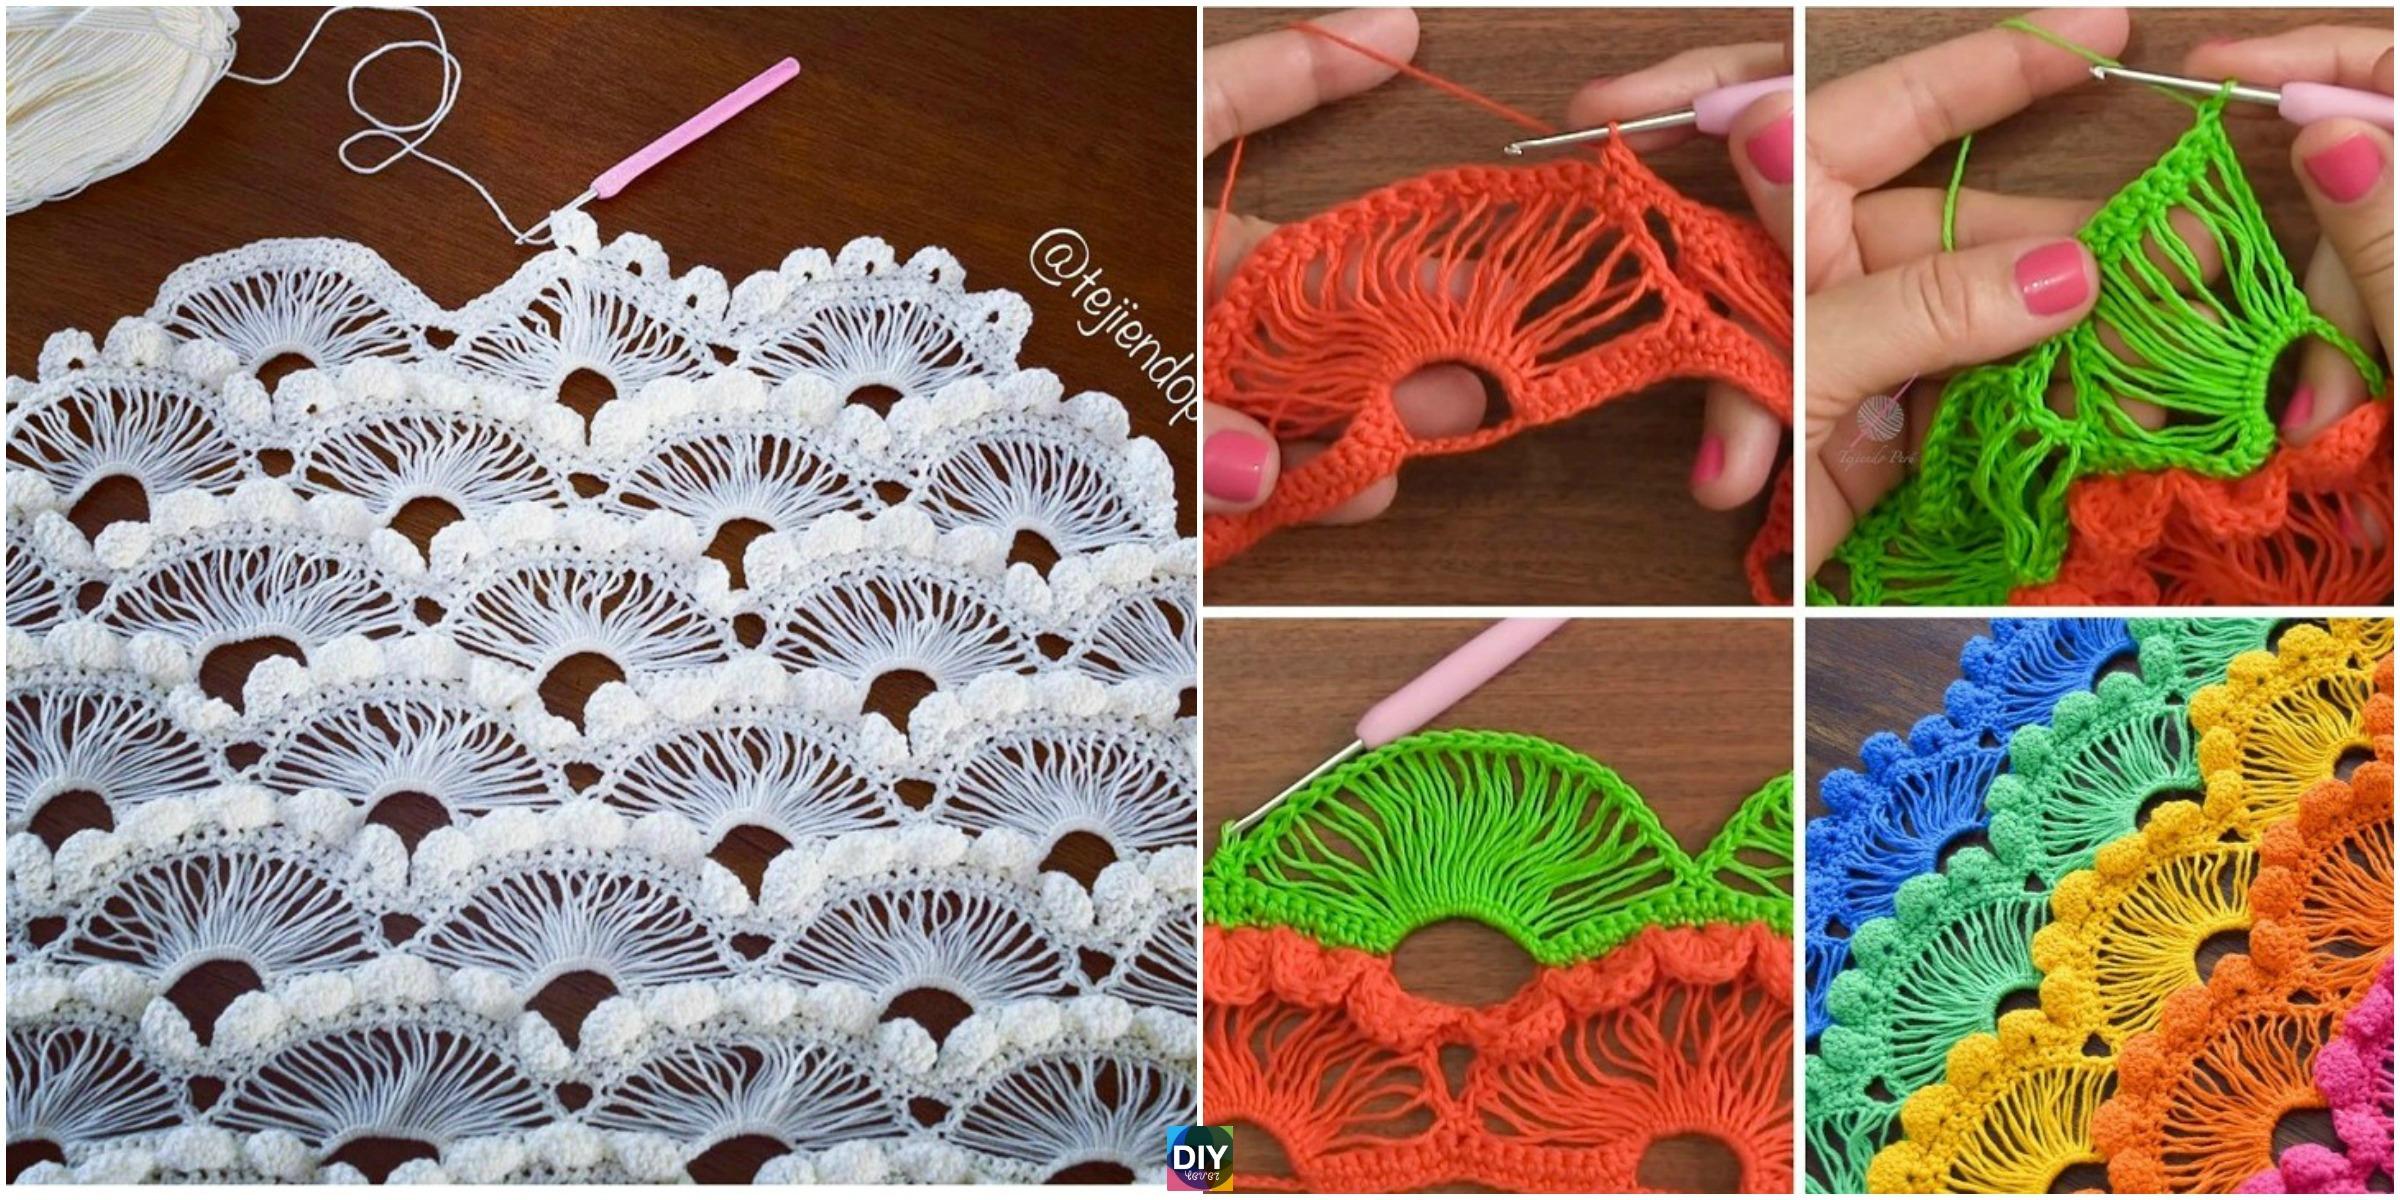 Crochet Fan Stitch – Step By Step Video Tutorial